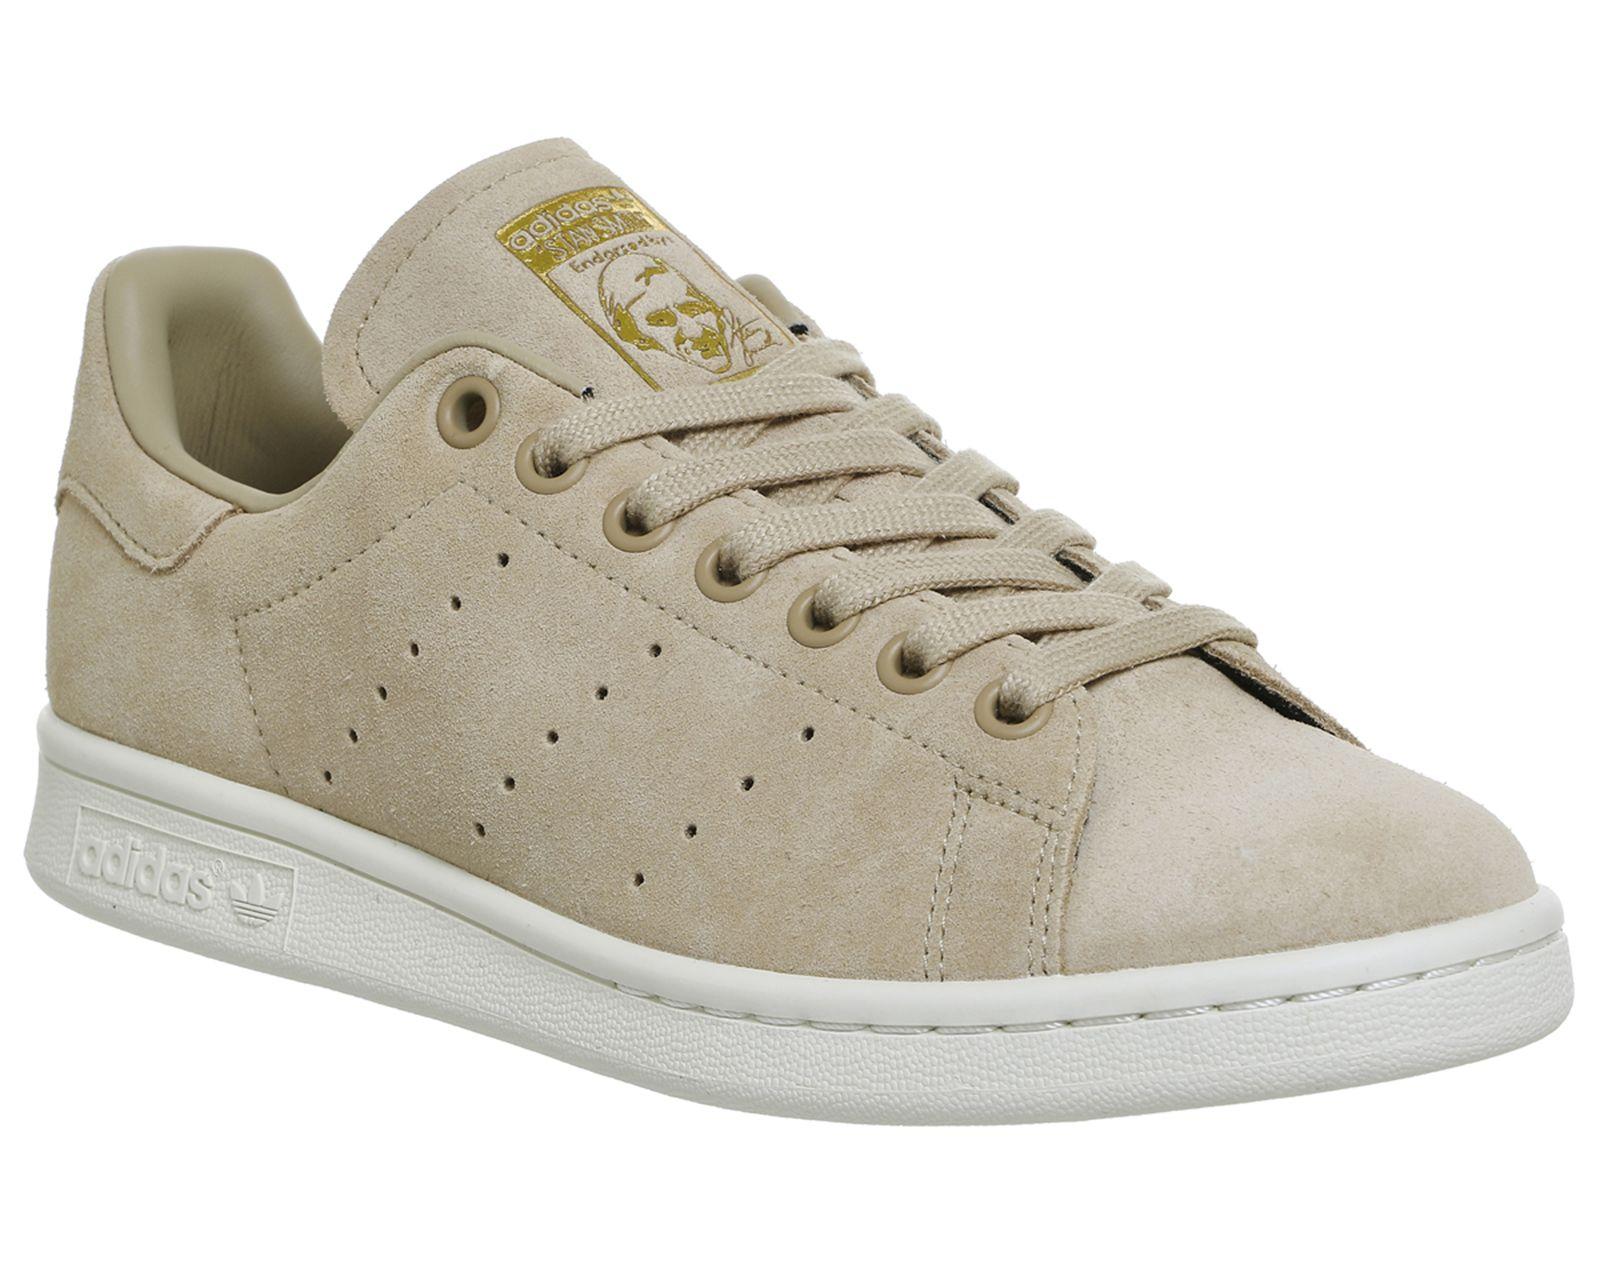 big sale 7e6e2 6dbf7 Adidas Stan Smith Linen Khaki Suede | Shoes in 2019 | Stan ...